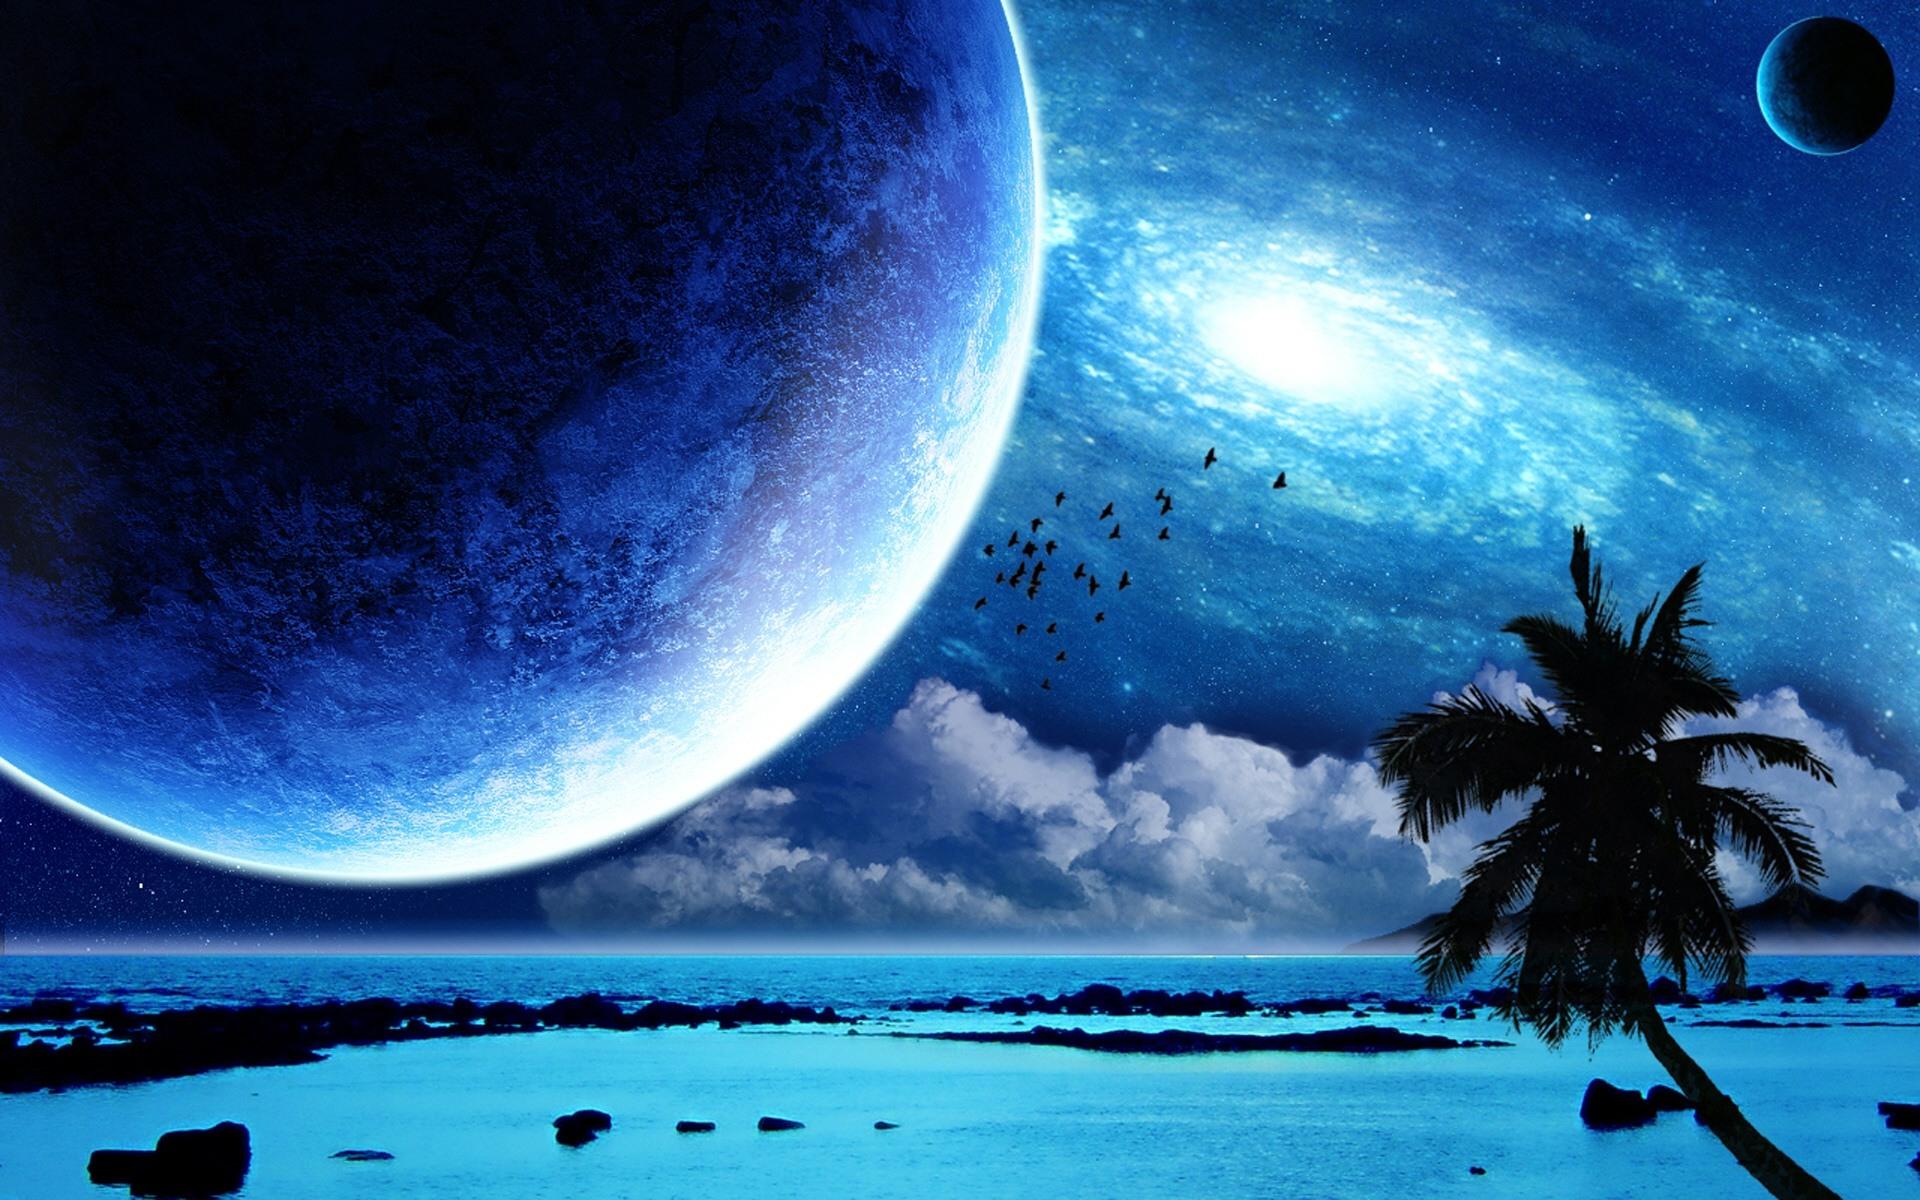 wallpaper island desktopia bazzza interstellar paradise original 1920x1200